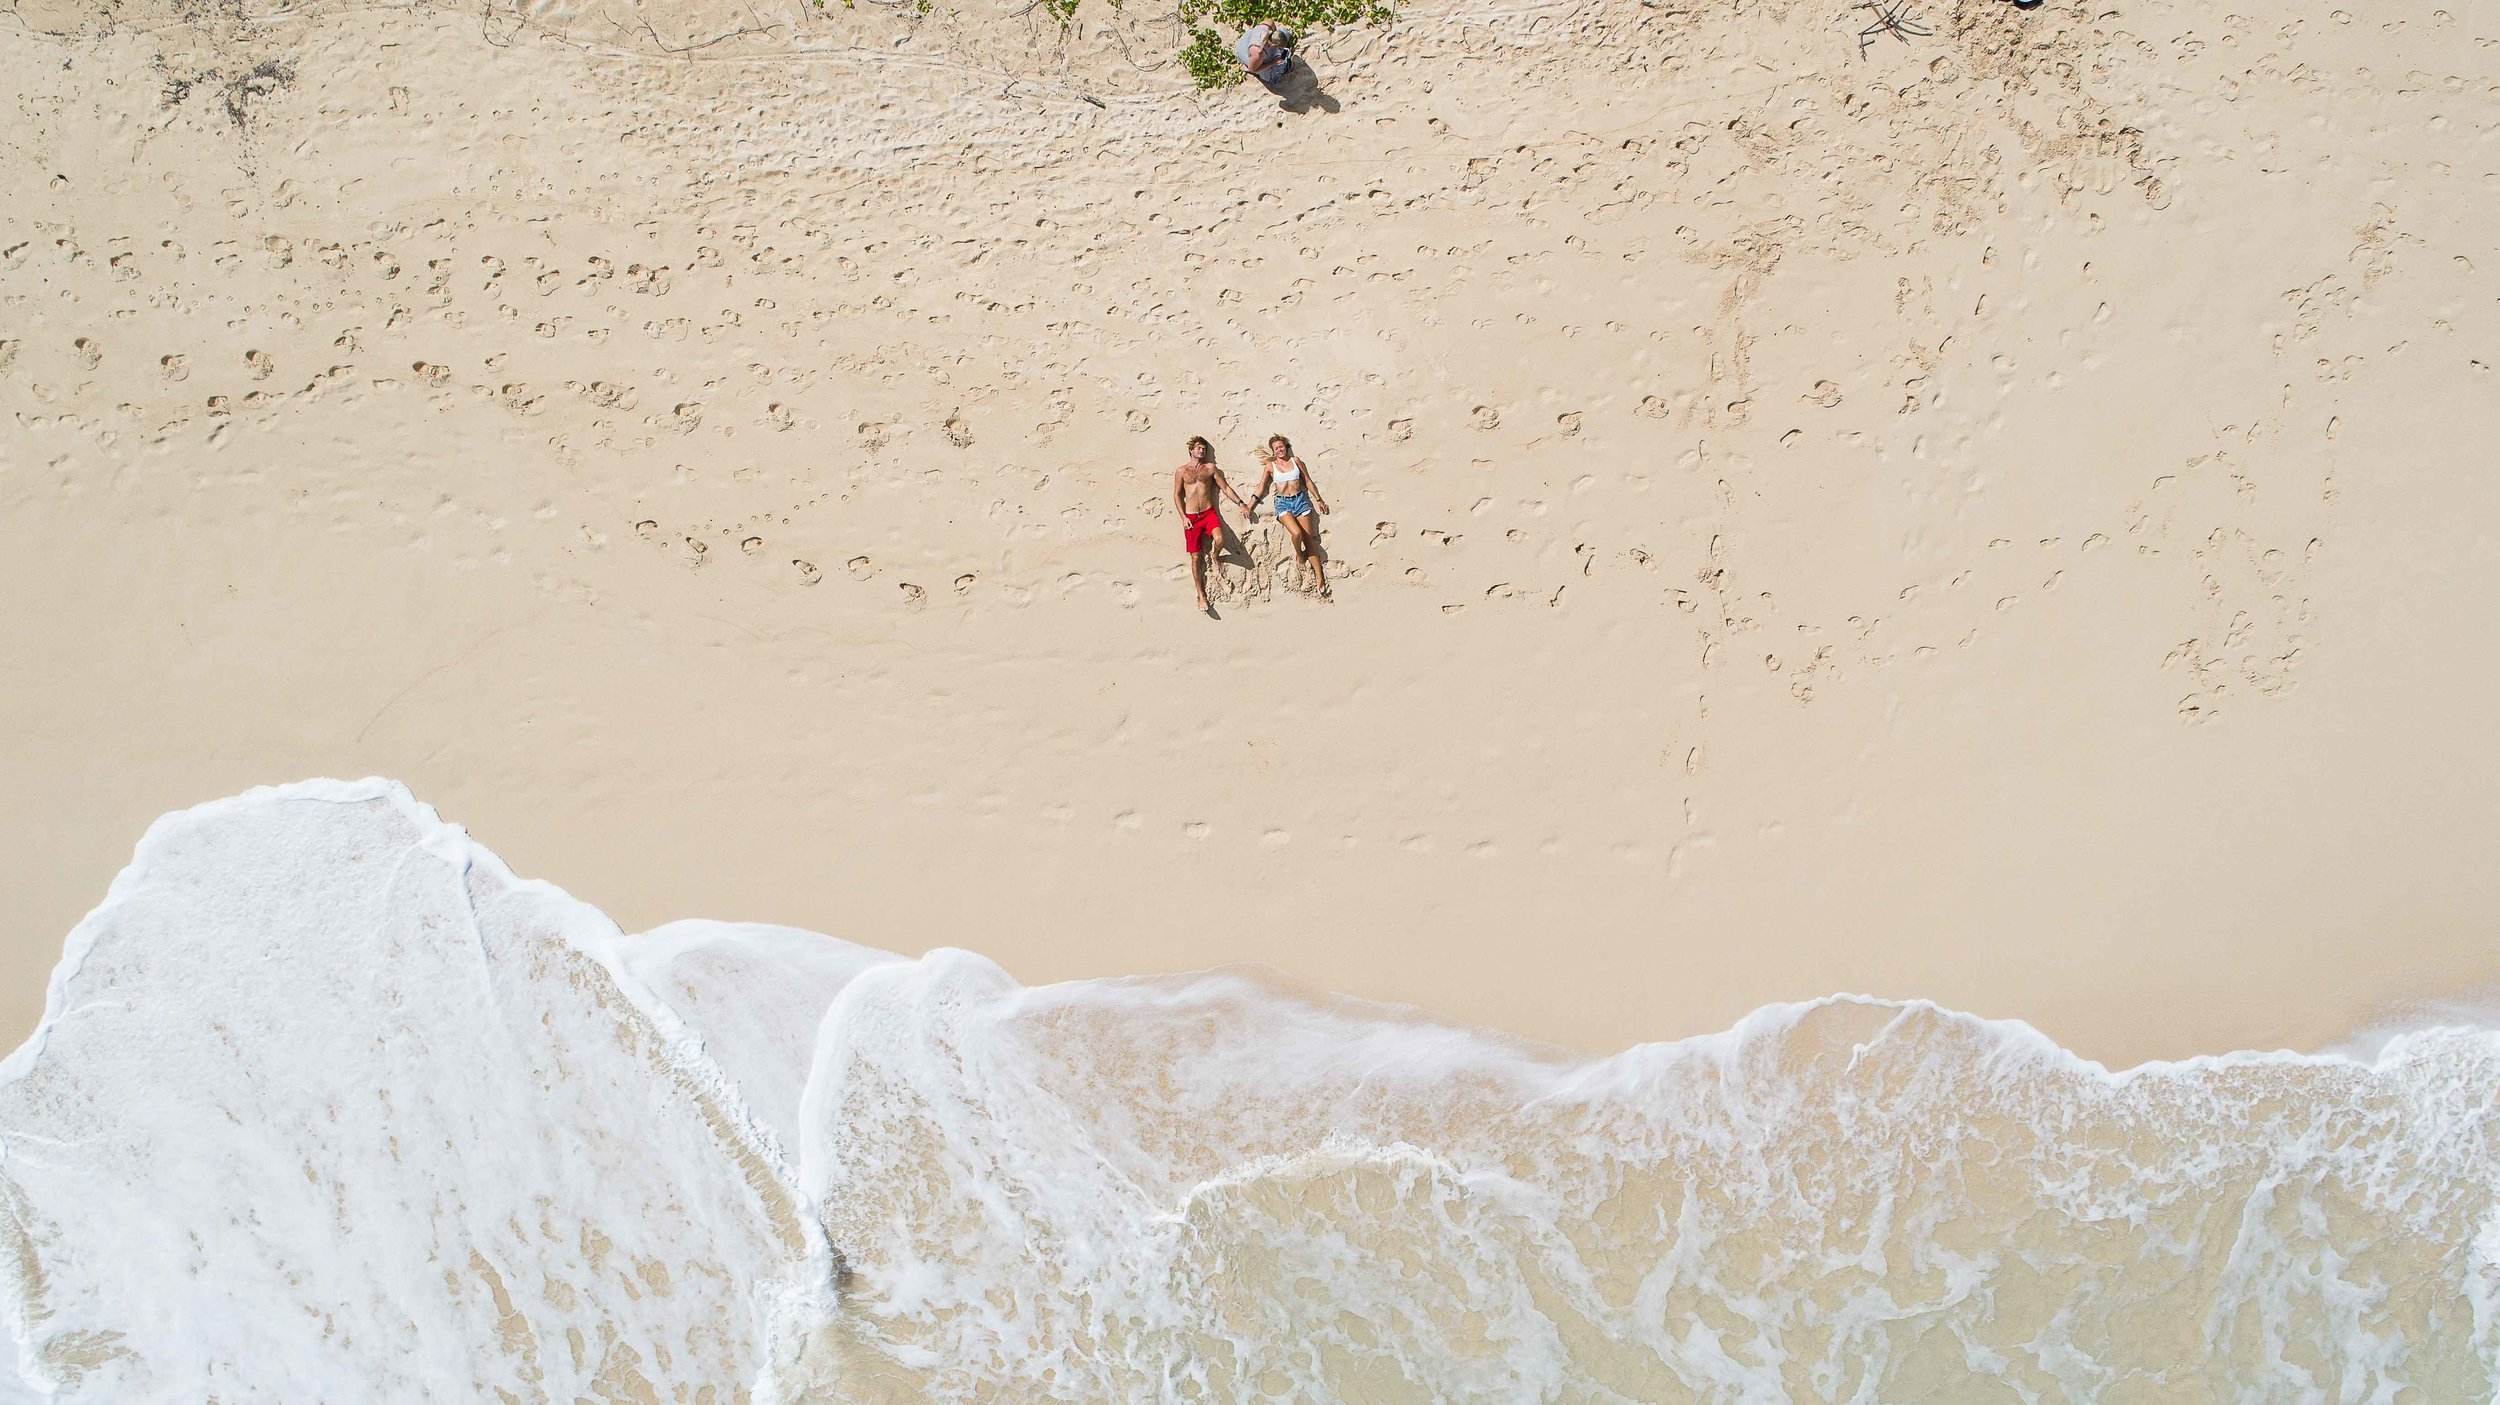 Drone photos-10.jpg